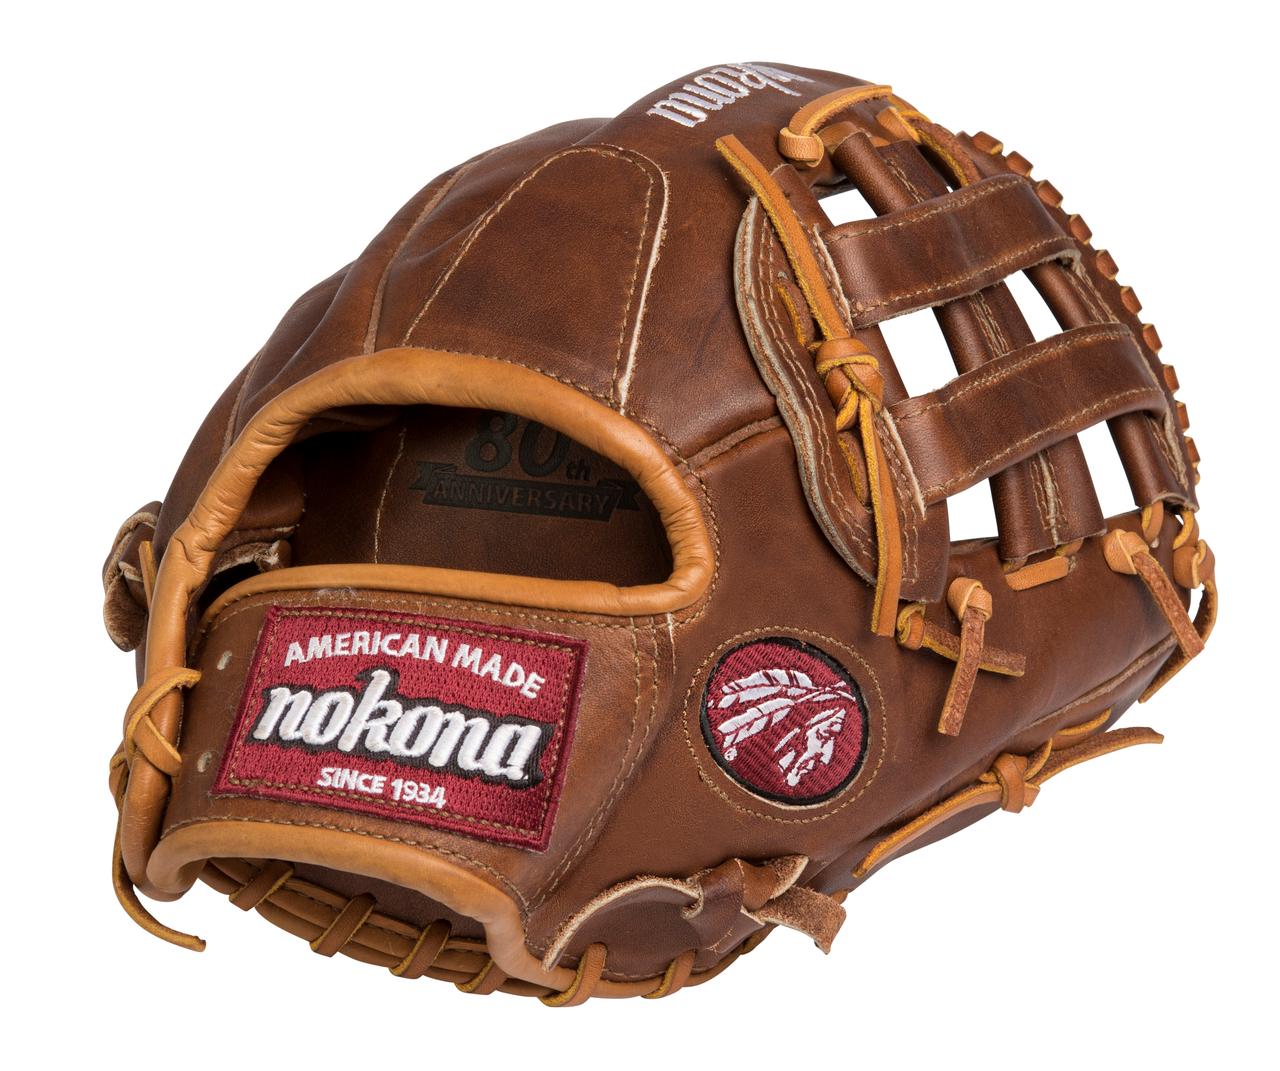 nokona baseball glove wb-1200h